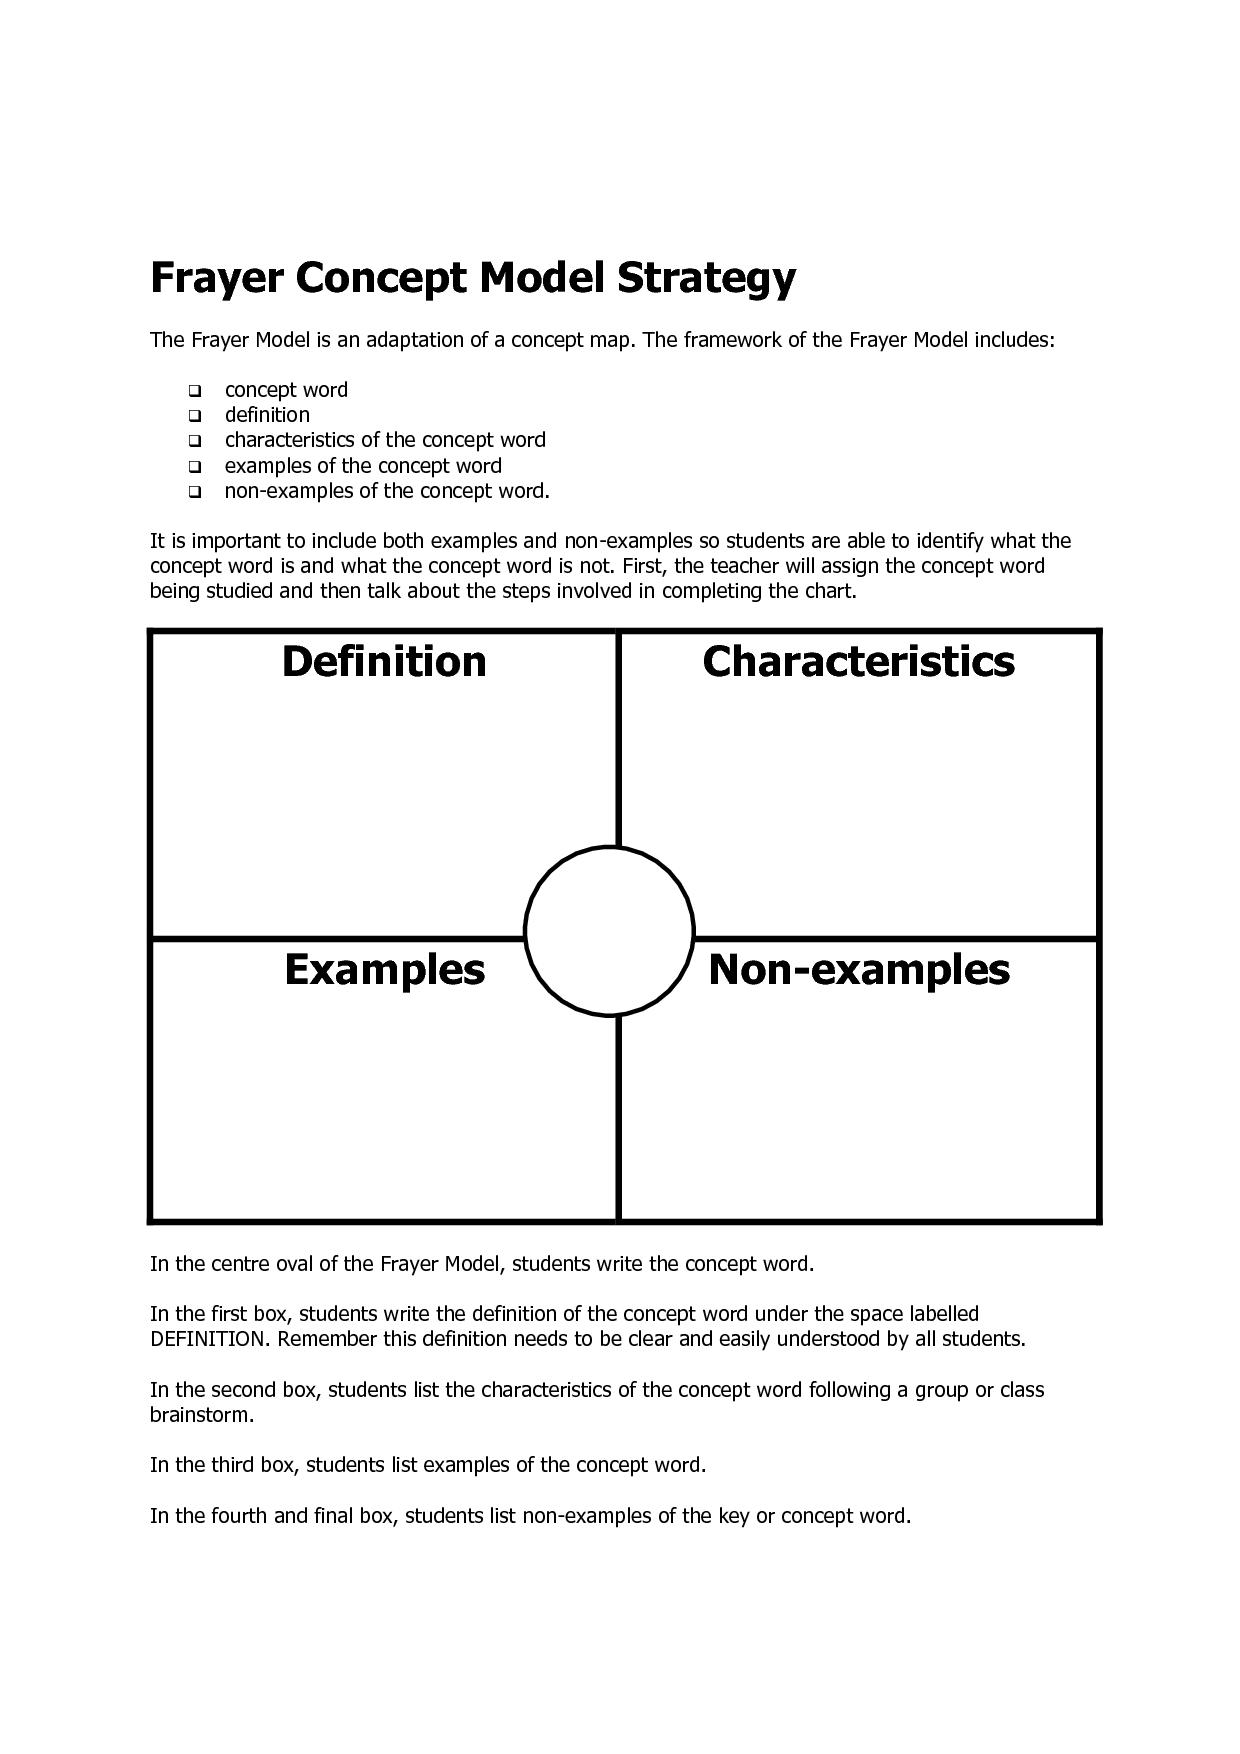 frayer model template word frayer concept model strategy